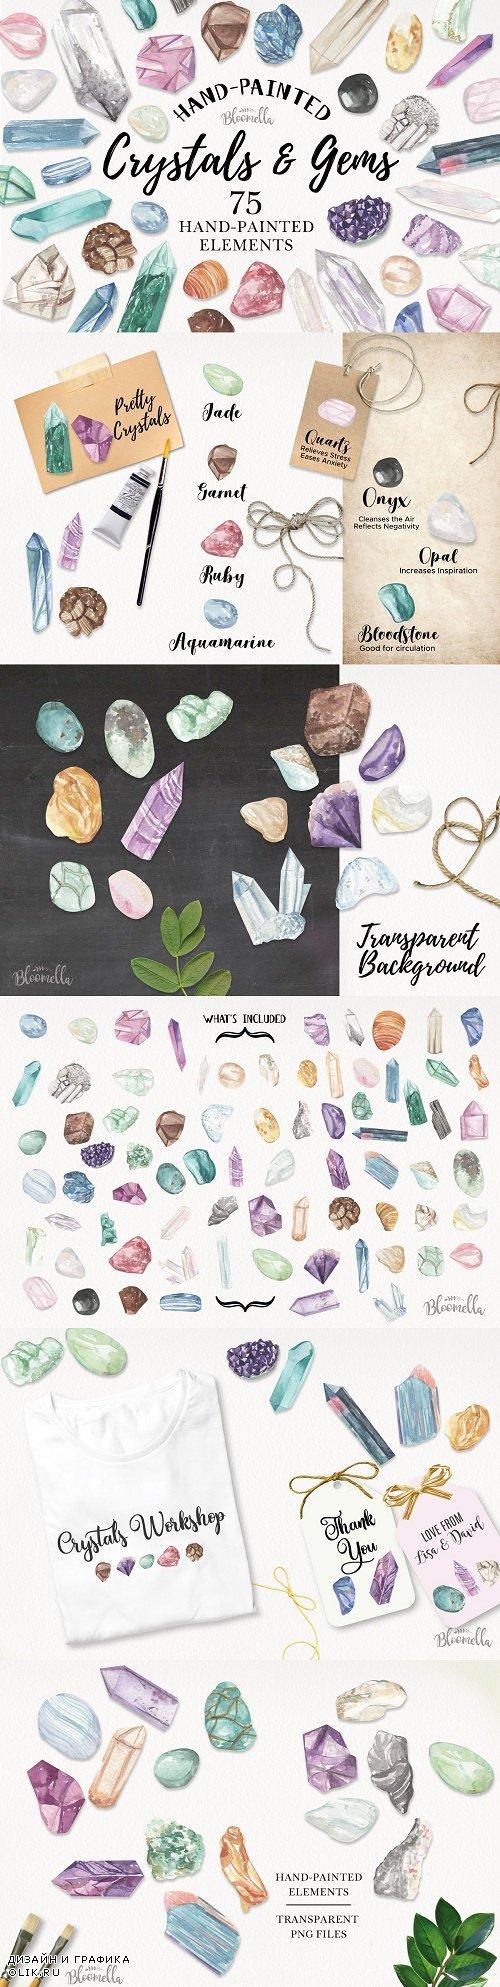 Crystals & Gems Watercolor 75 Set - 3851437